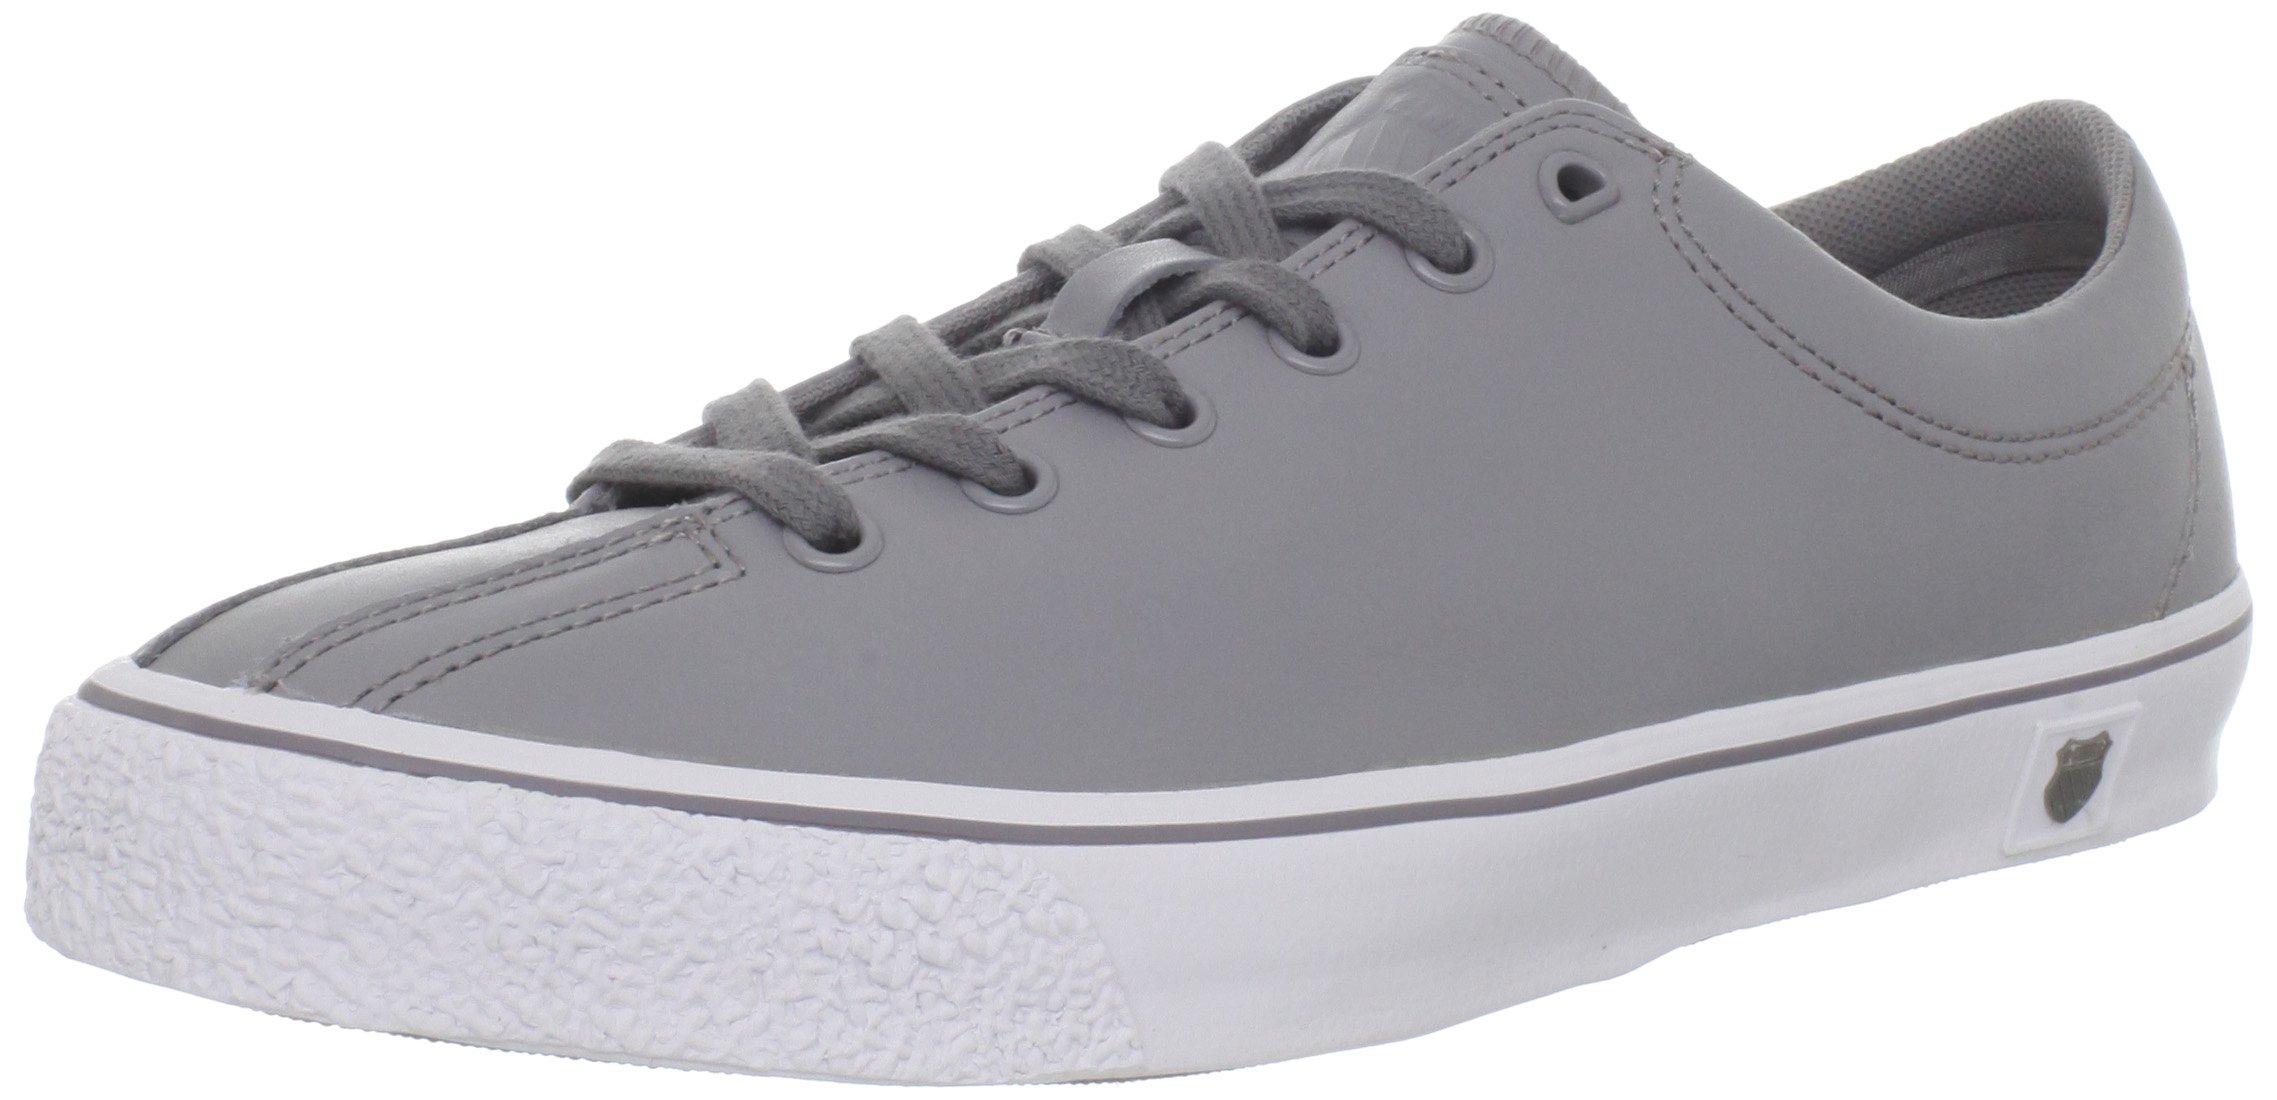 K-Swiss Clean Laguna VNZ Sneaker,Stingray/White/Gum,11.5 M US